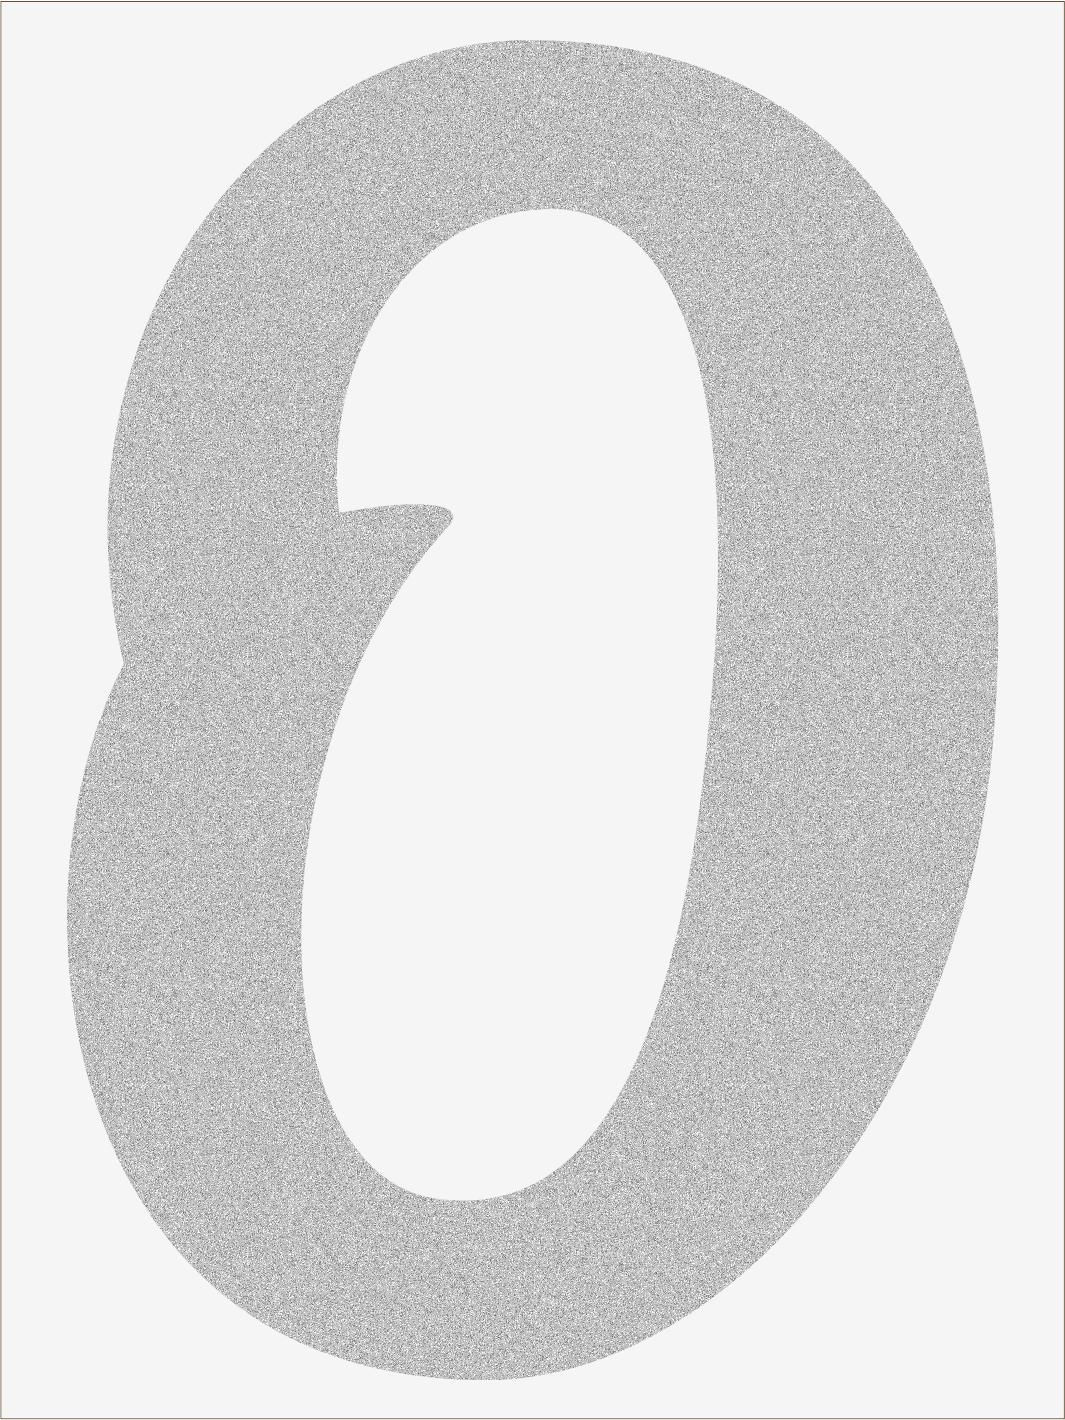 Číslica 0 font1